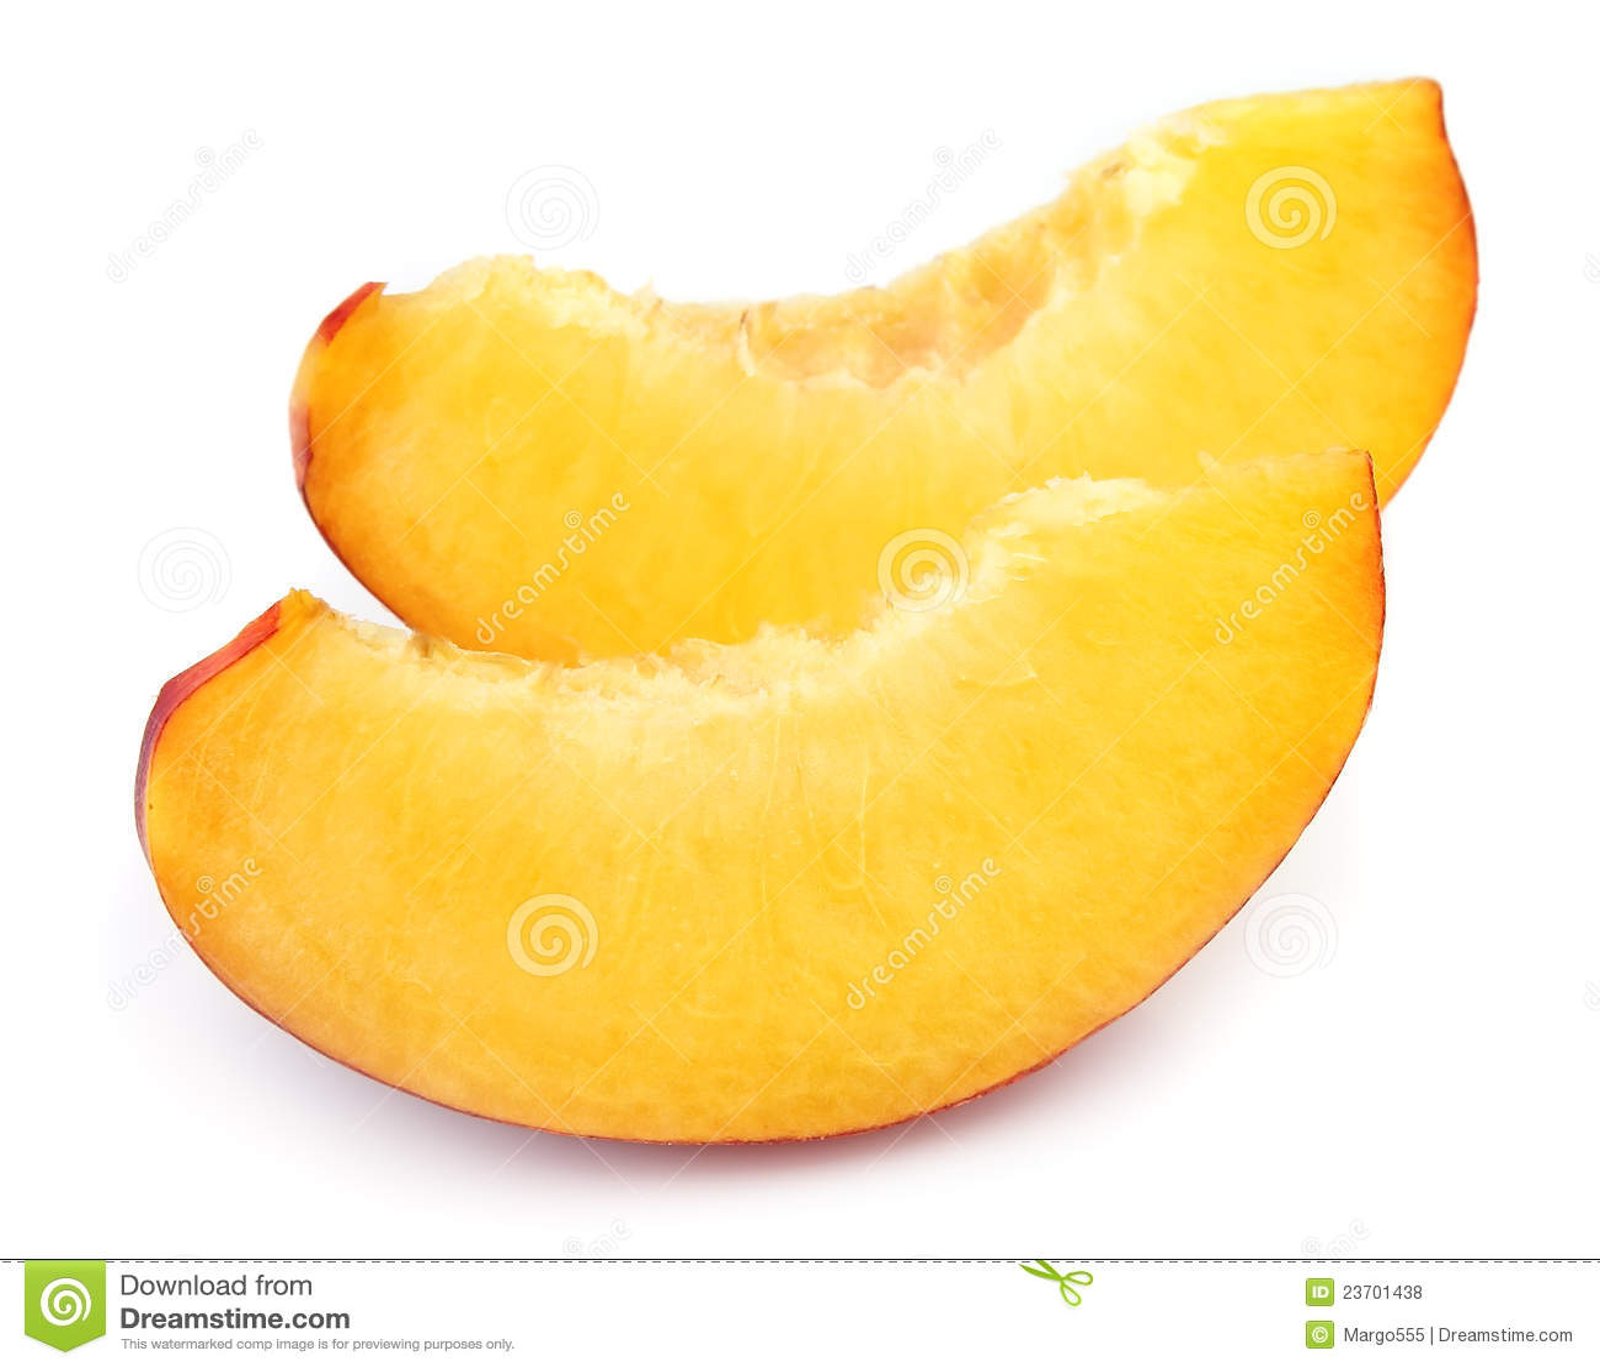 Juicy Peach Slices Royalty Free Stock Photos - Image: 23701438